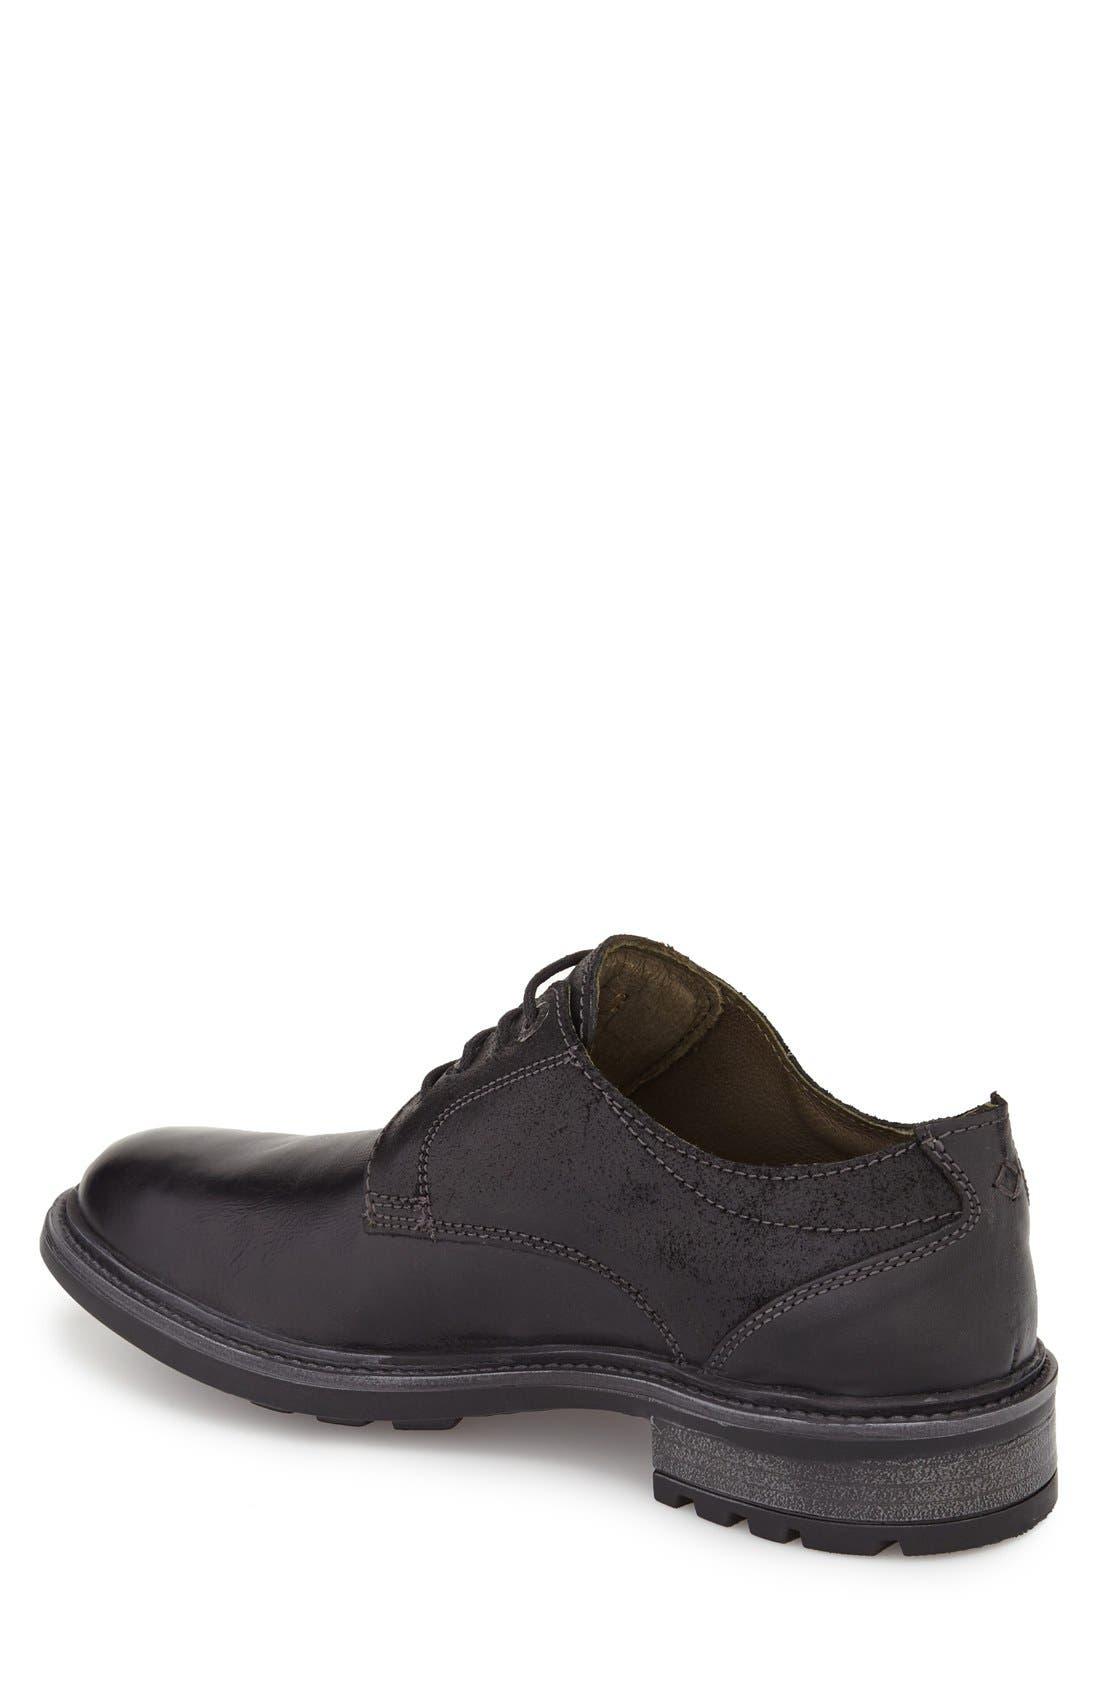 Oscar Plain Toe Derby,                             Alternate thumbnail 2, color,                             Black Leather